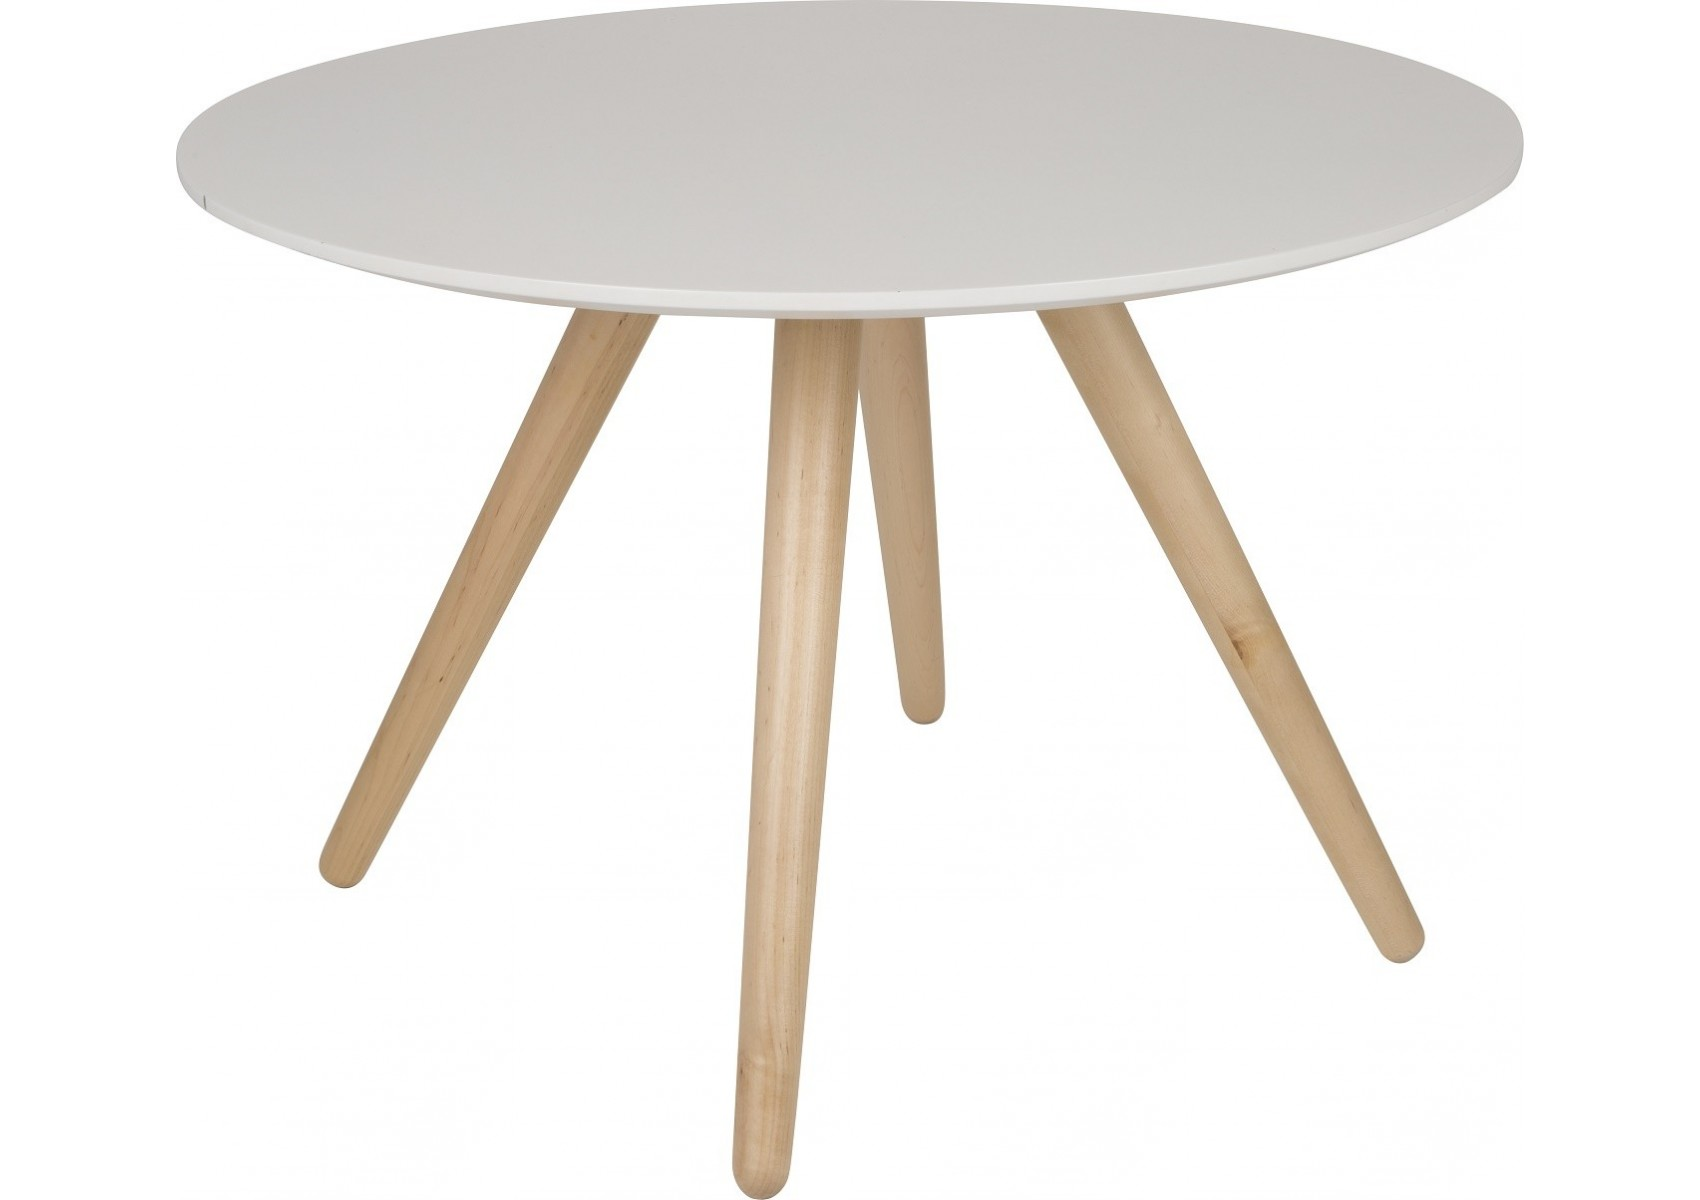 table basse bee 75x50 design zuiver boite design. Black Bedroom Furniture Sets. Home Design Ideas